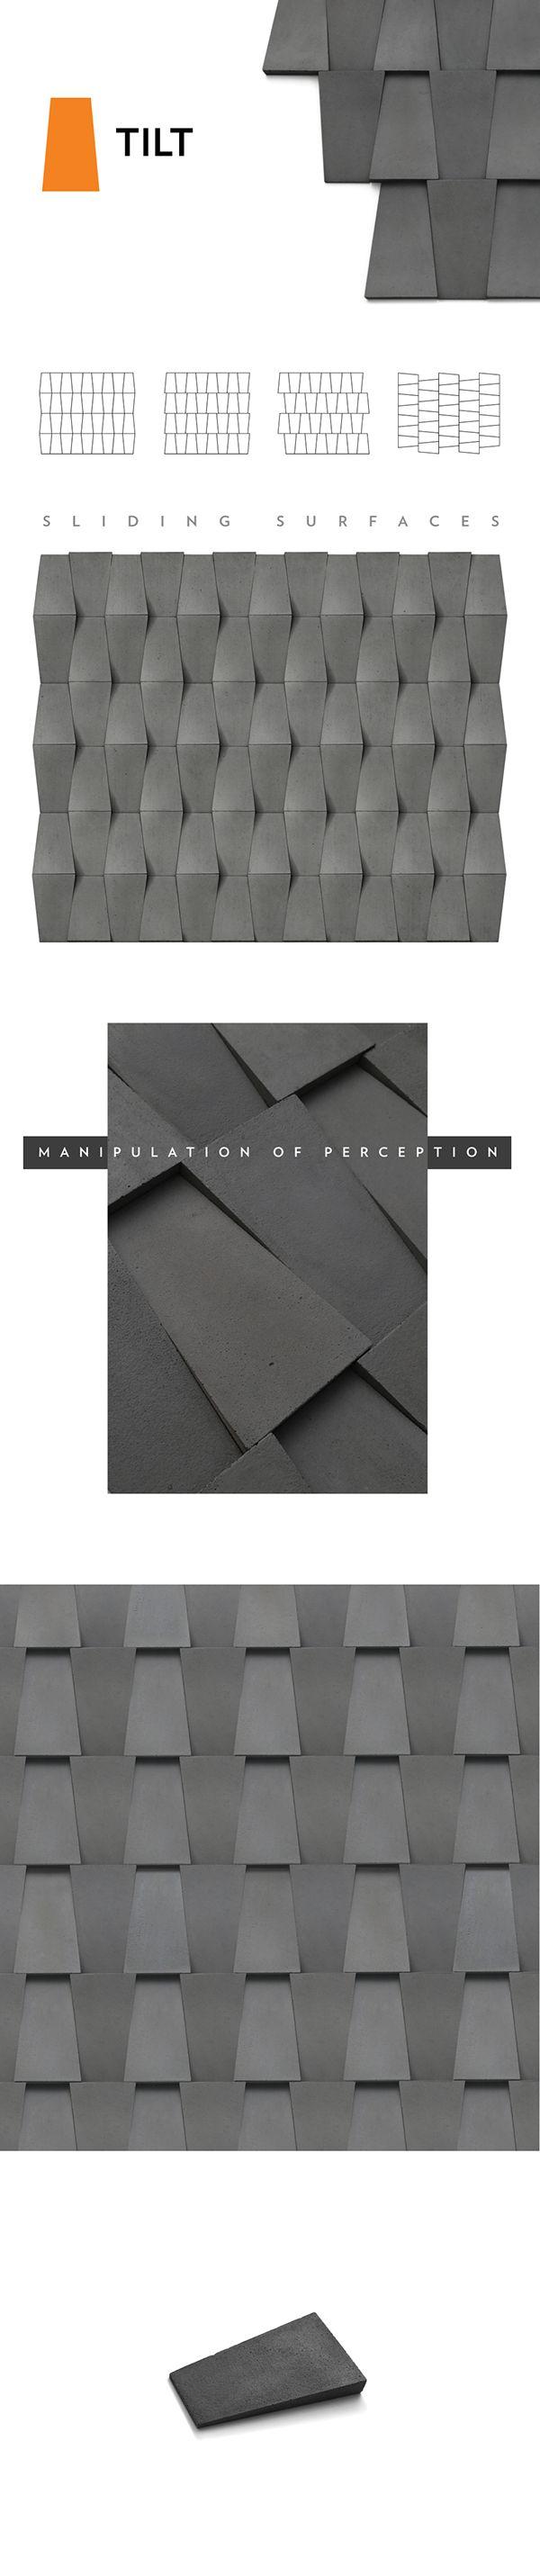 TILT- Simplicity of contrast effect.- Manipulation of perception.- Sliding surfaces.25 x 15 cm.